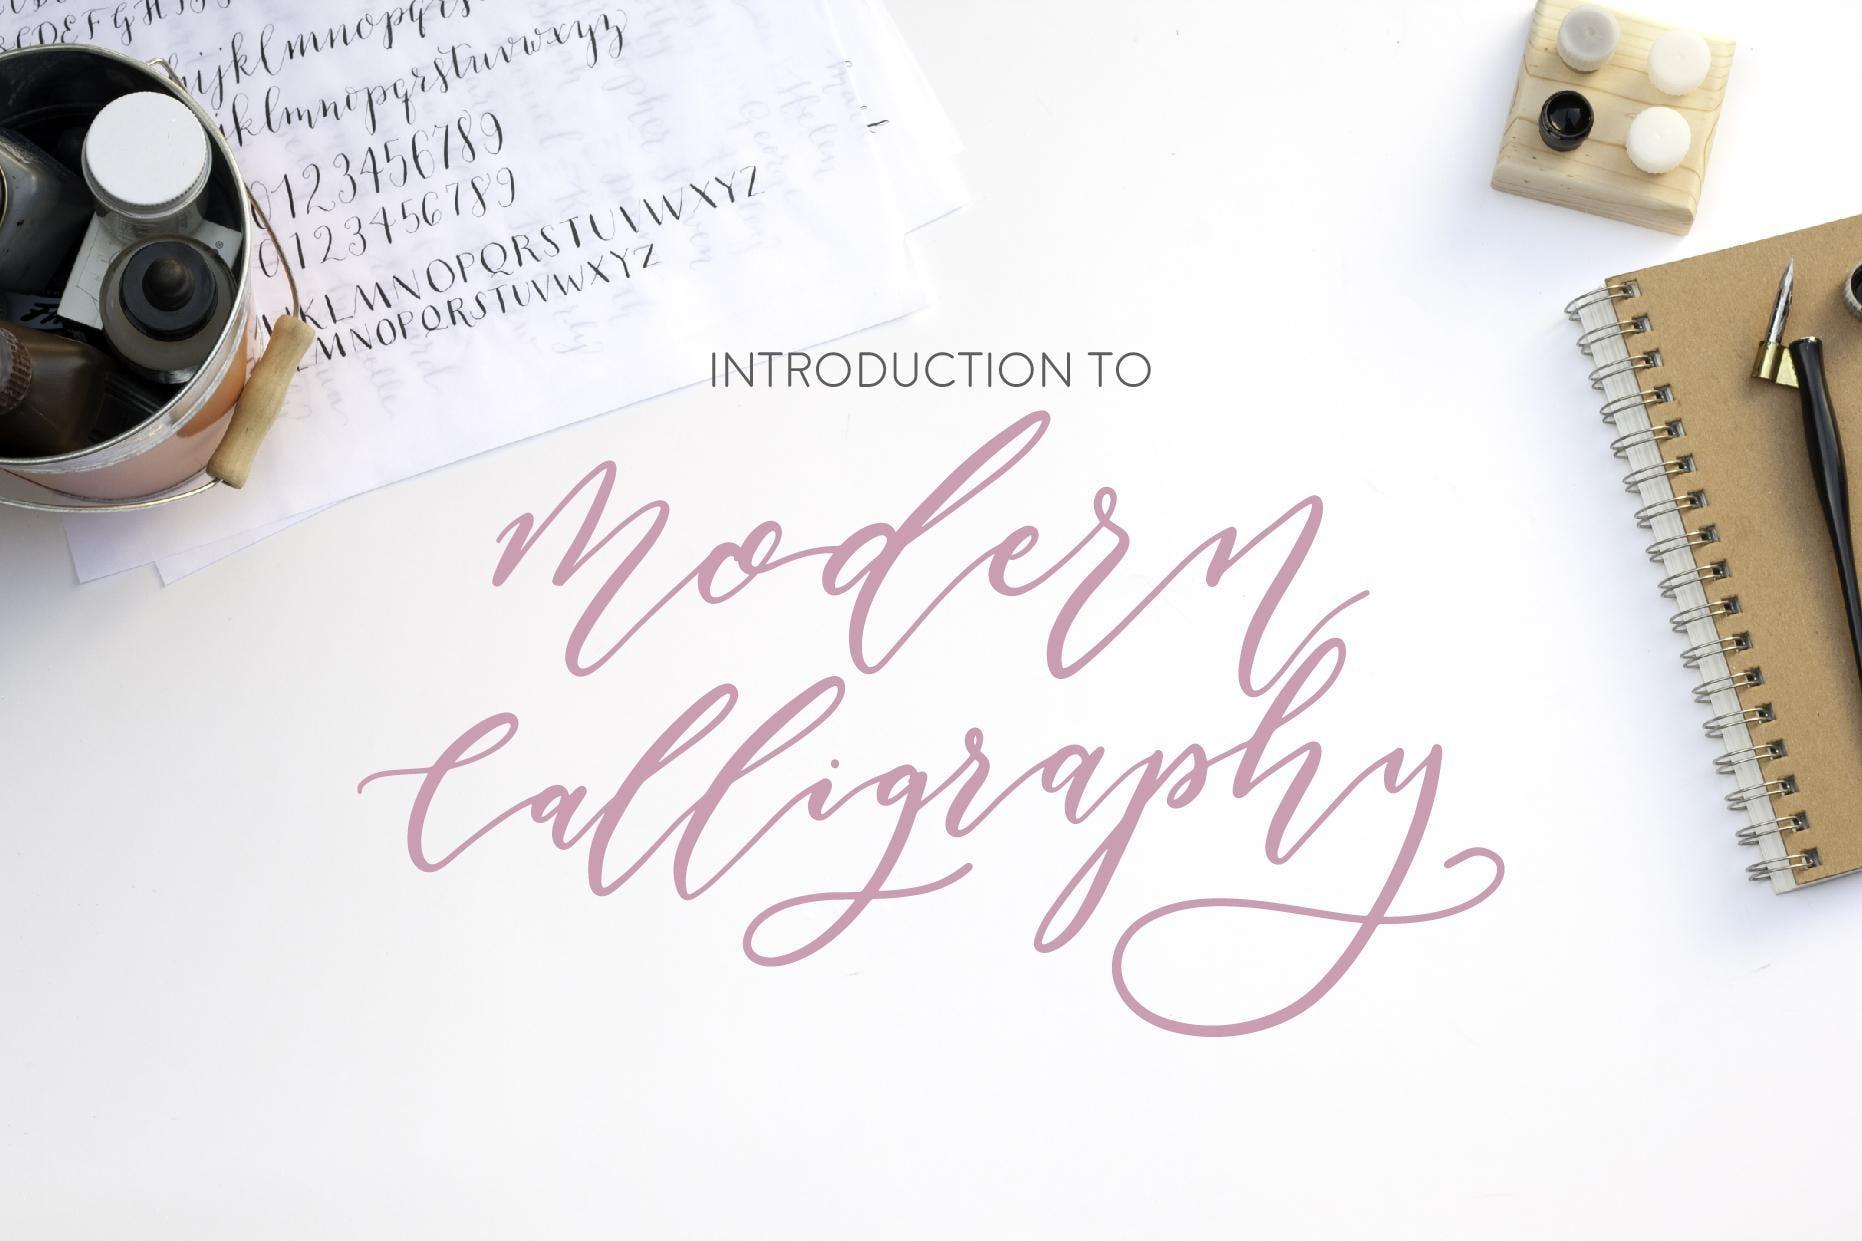 Introduction to modern calligraphy masterclass lagos nigeria 1